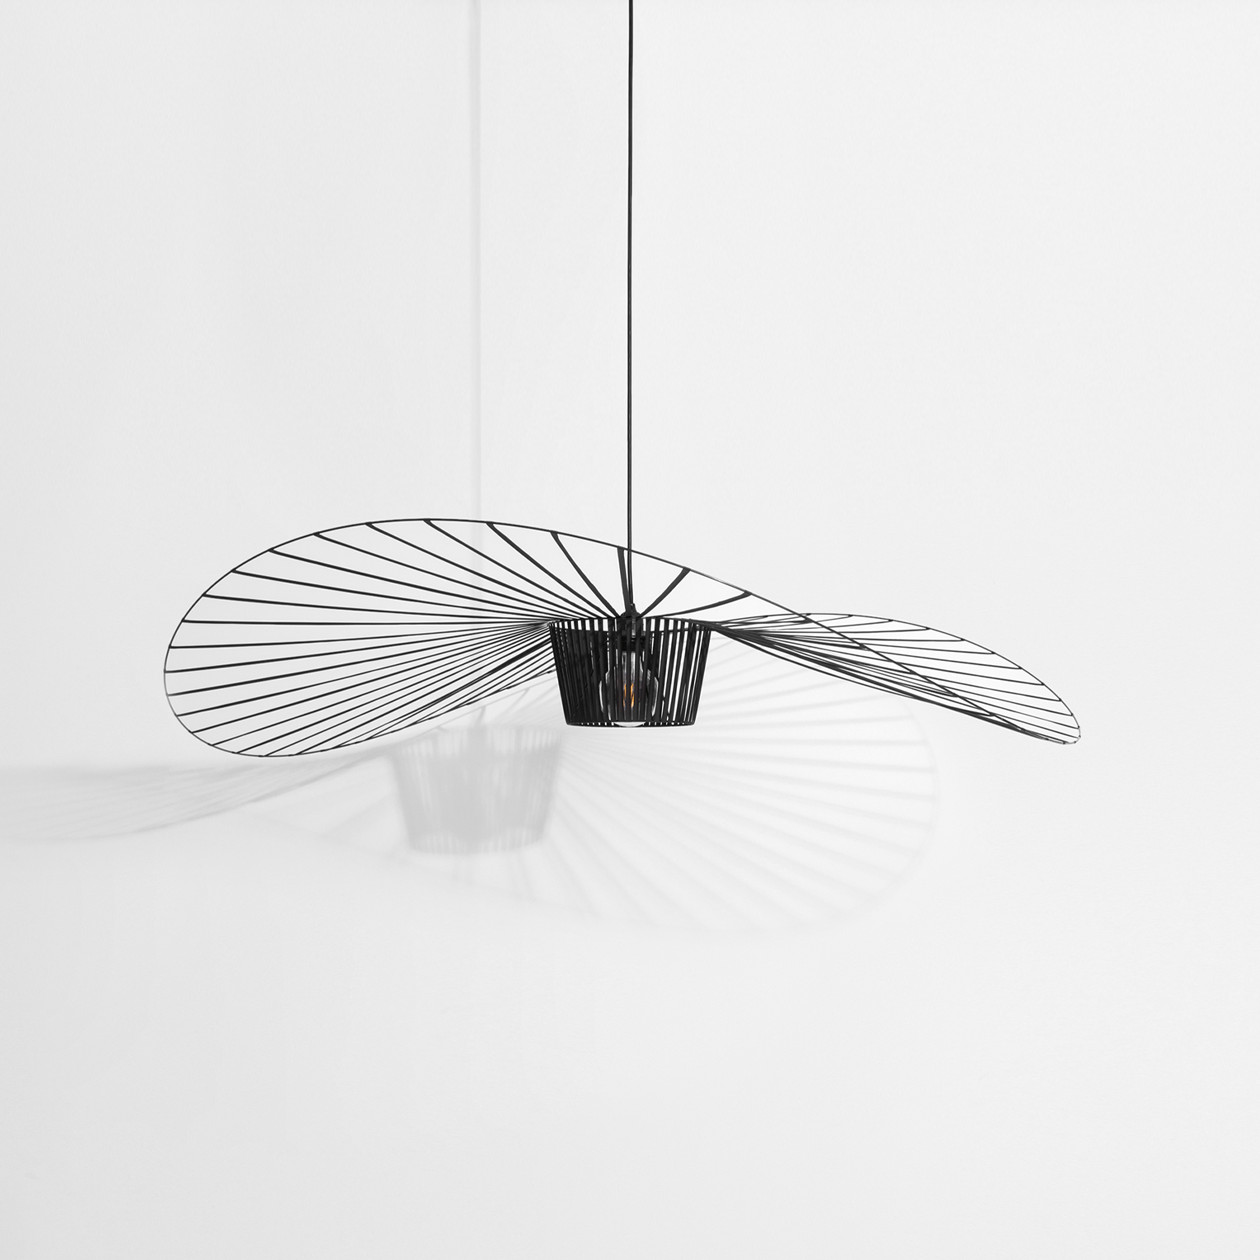 Idées cadeaux de noel design 2020 - Lampe vertigo Petite friture⎮ Armony Cuisine La Garenne-Colombes